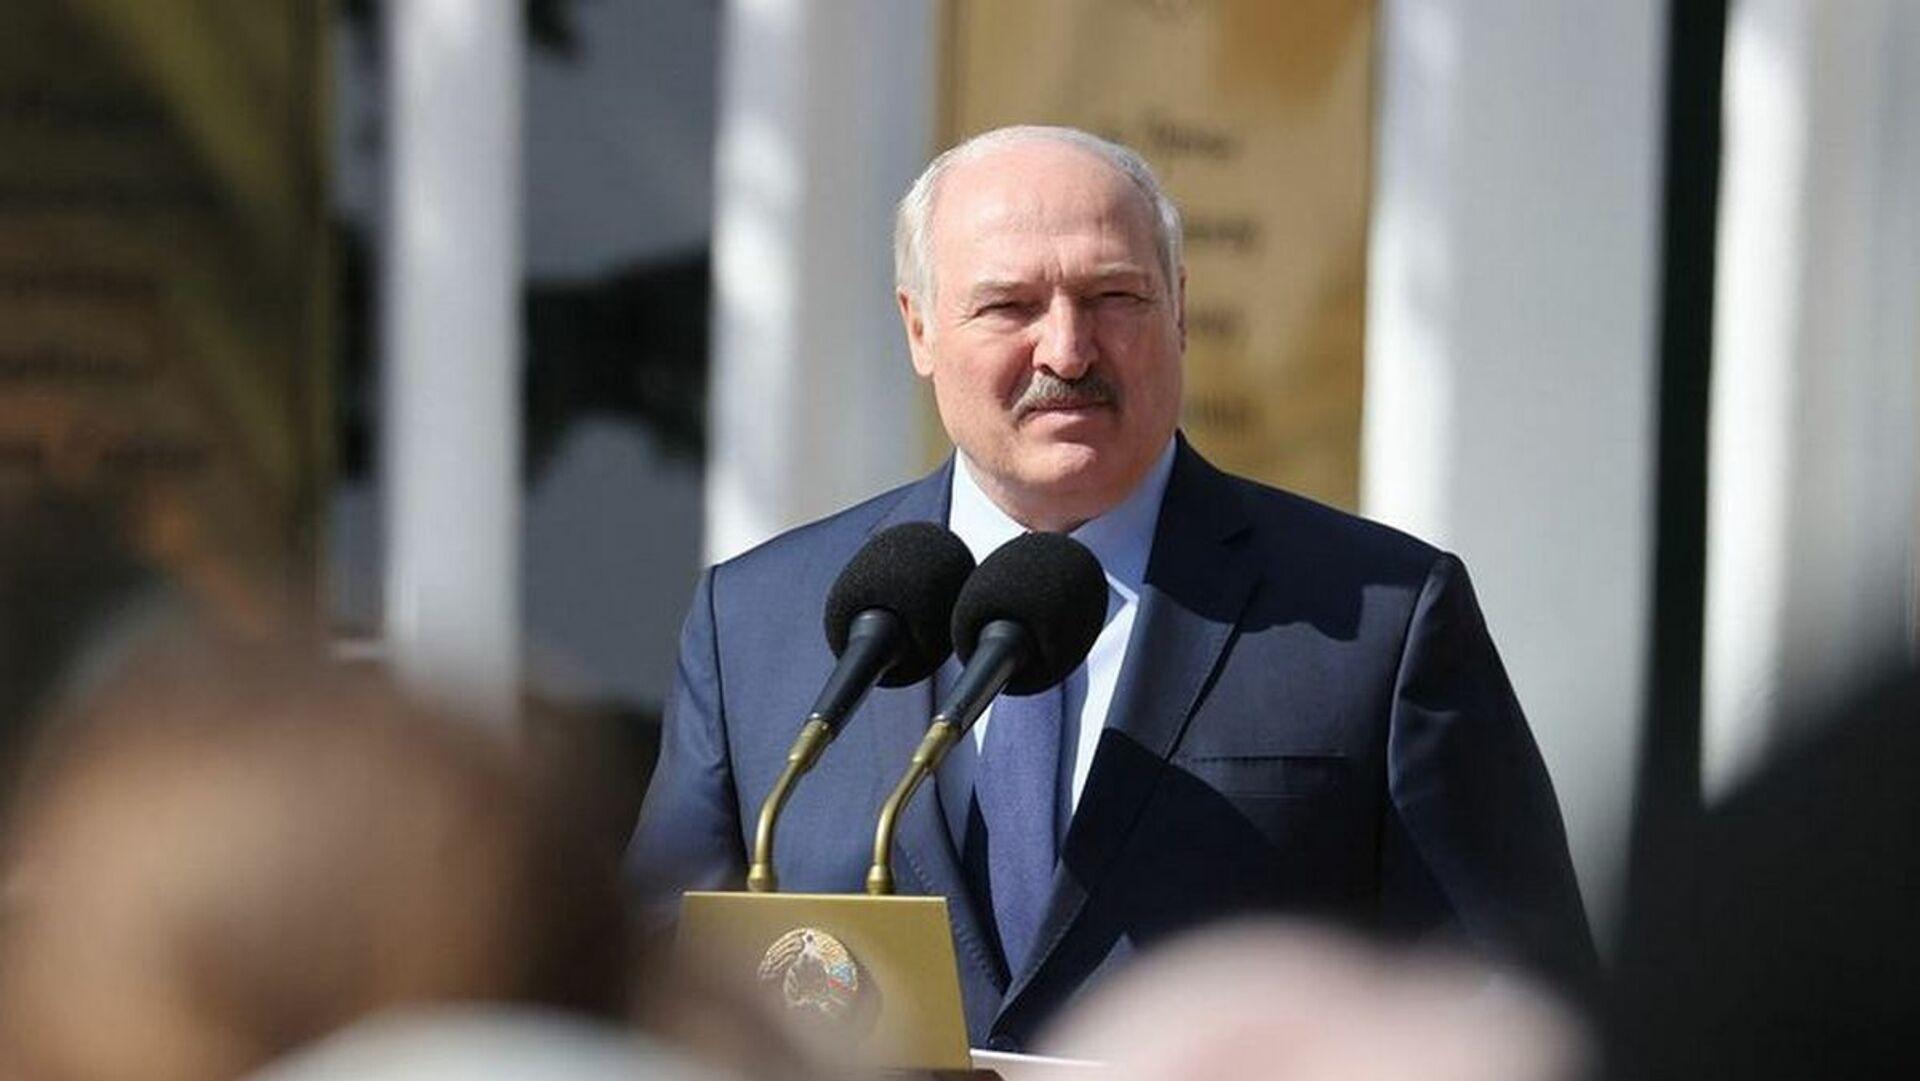 Аляксандр Лукашэнка - Sputnik Беларусь, 1920, 27.08.2021